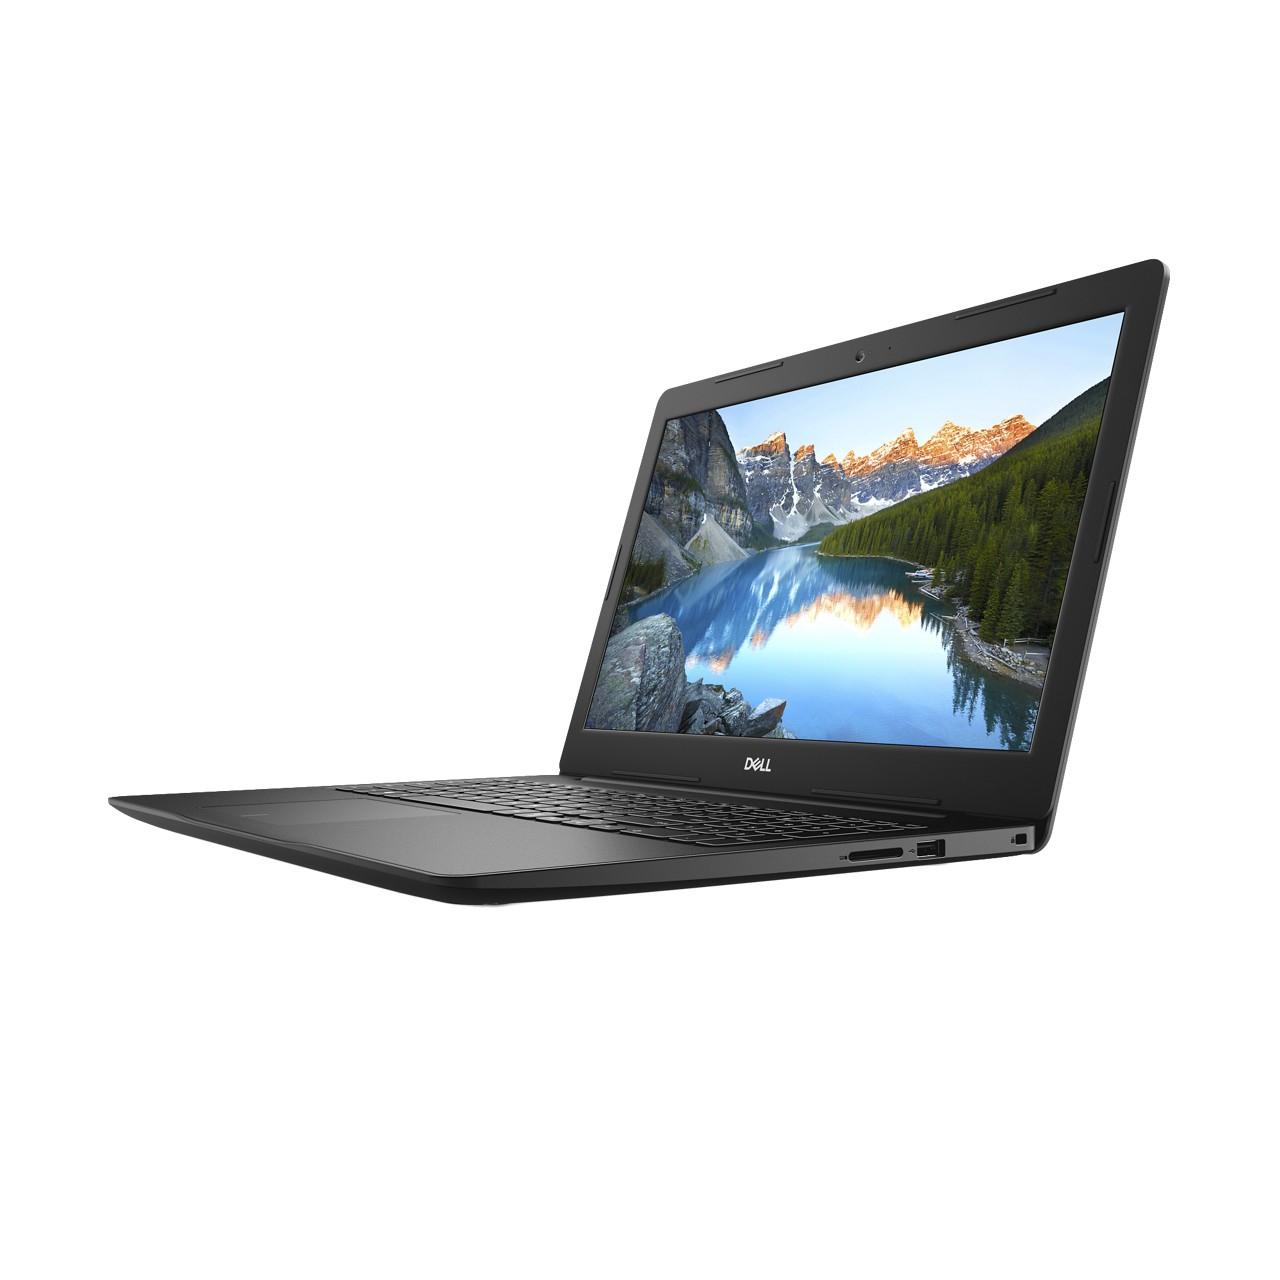 Notebook Dell Inspiron 3584 Core I3 7020U Memoria 4Gb Hd 1Tb Tela 15.6' Led Hd Sistema Linux